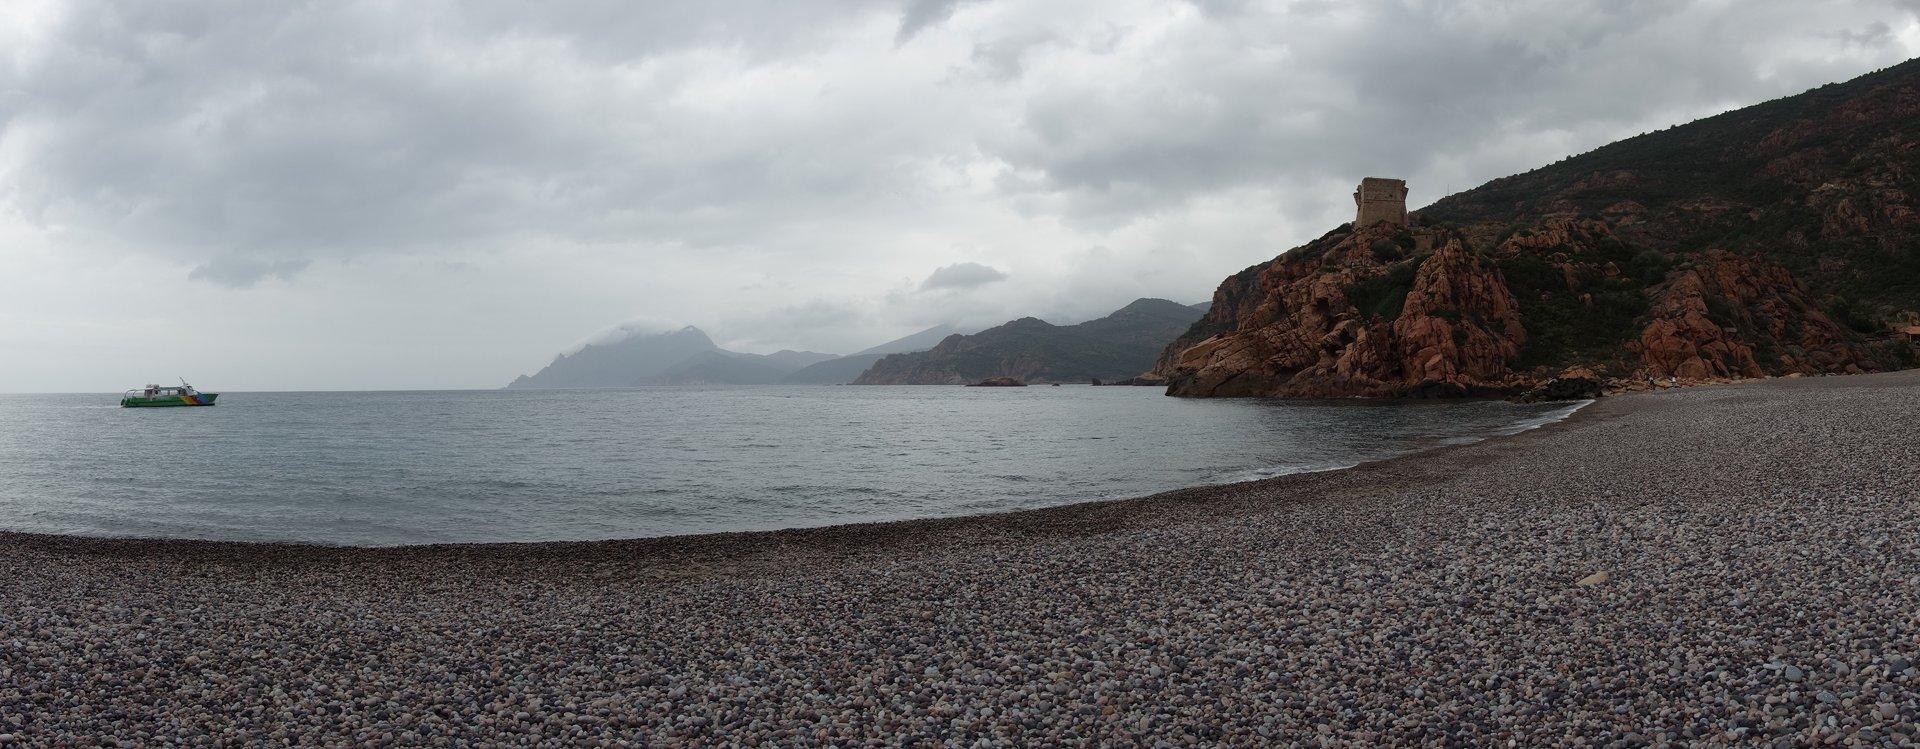 plage de galets en Corse